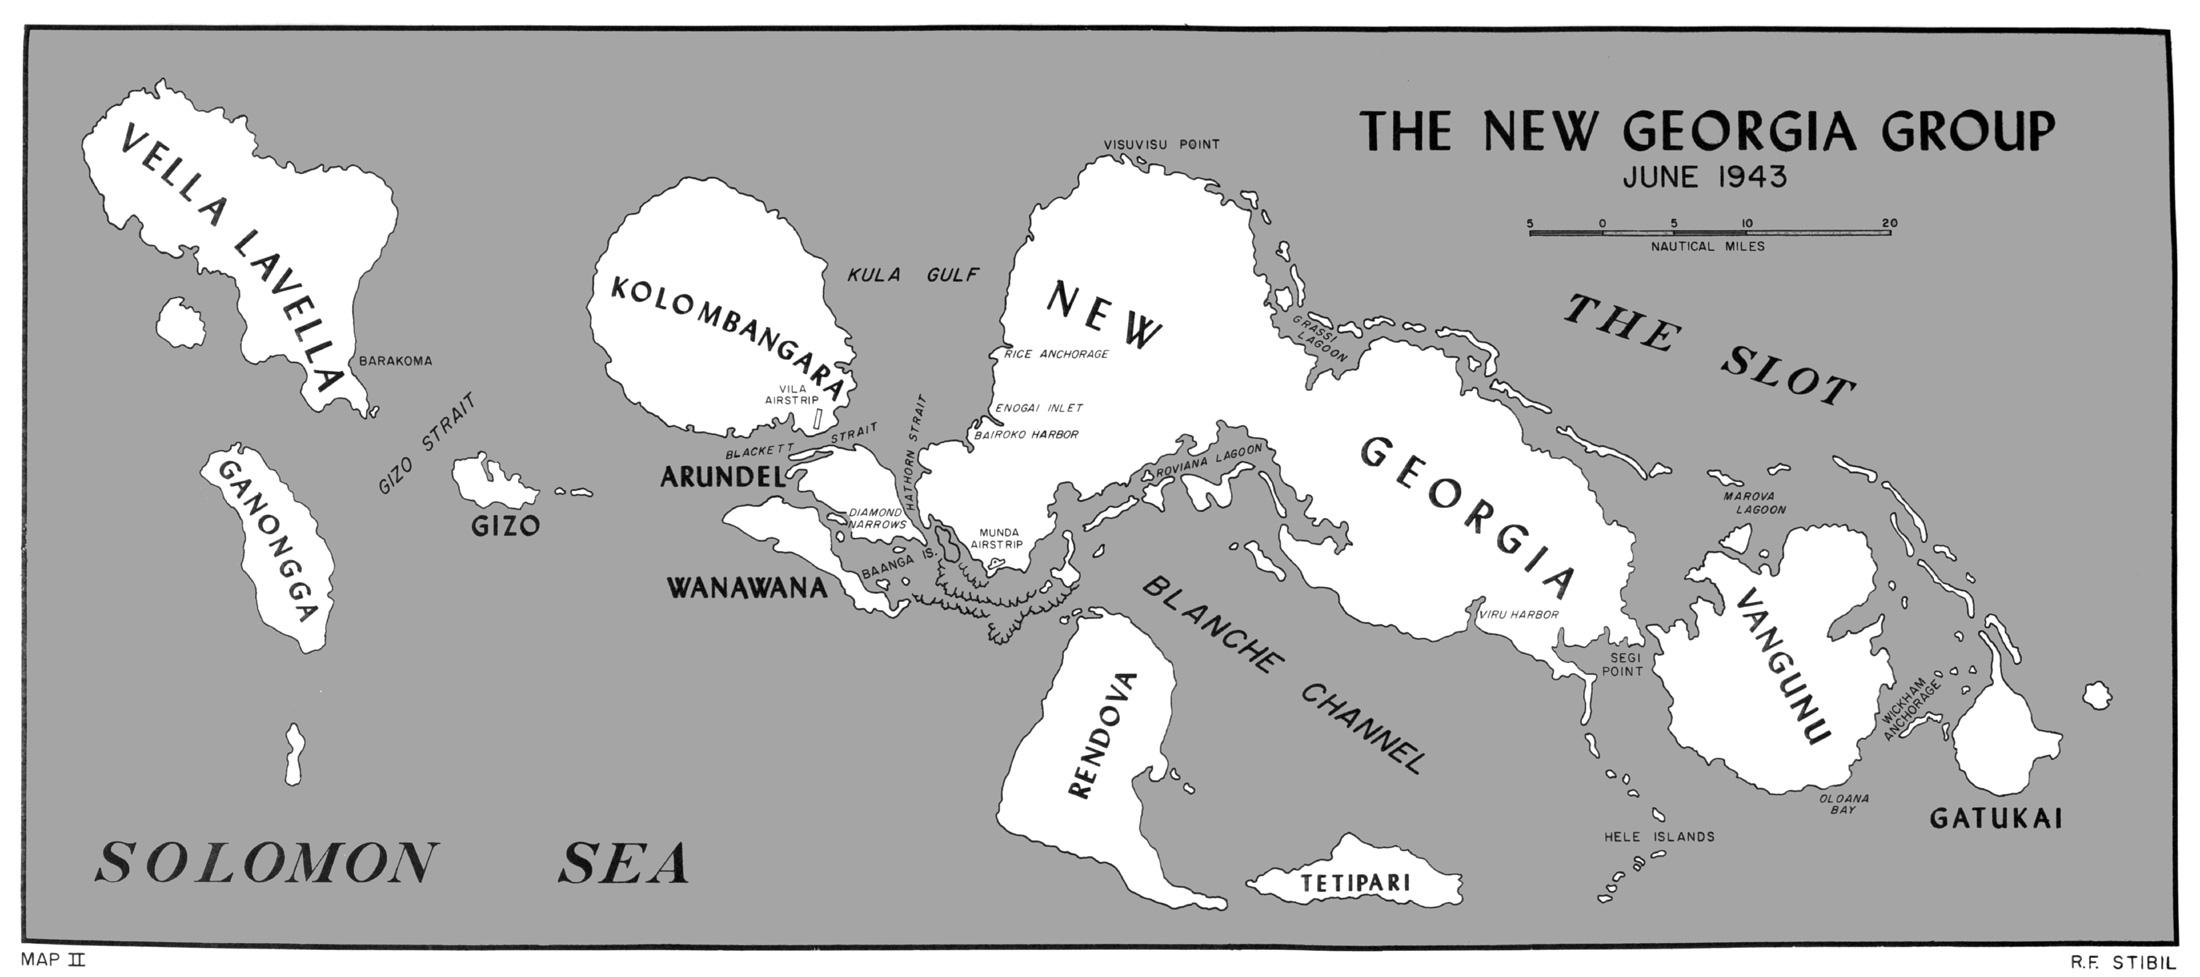 The New Georgia Group